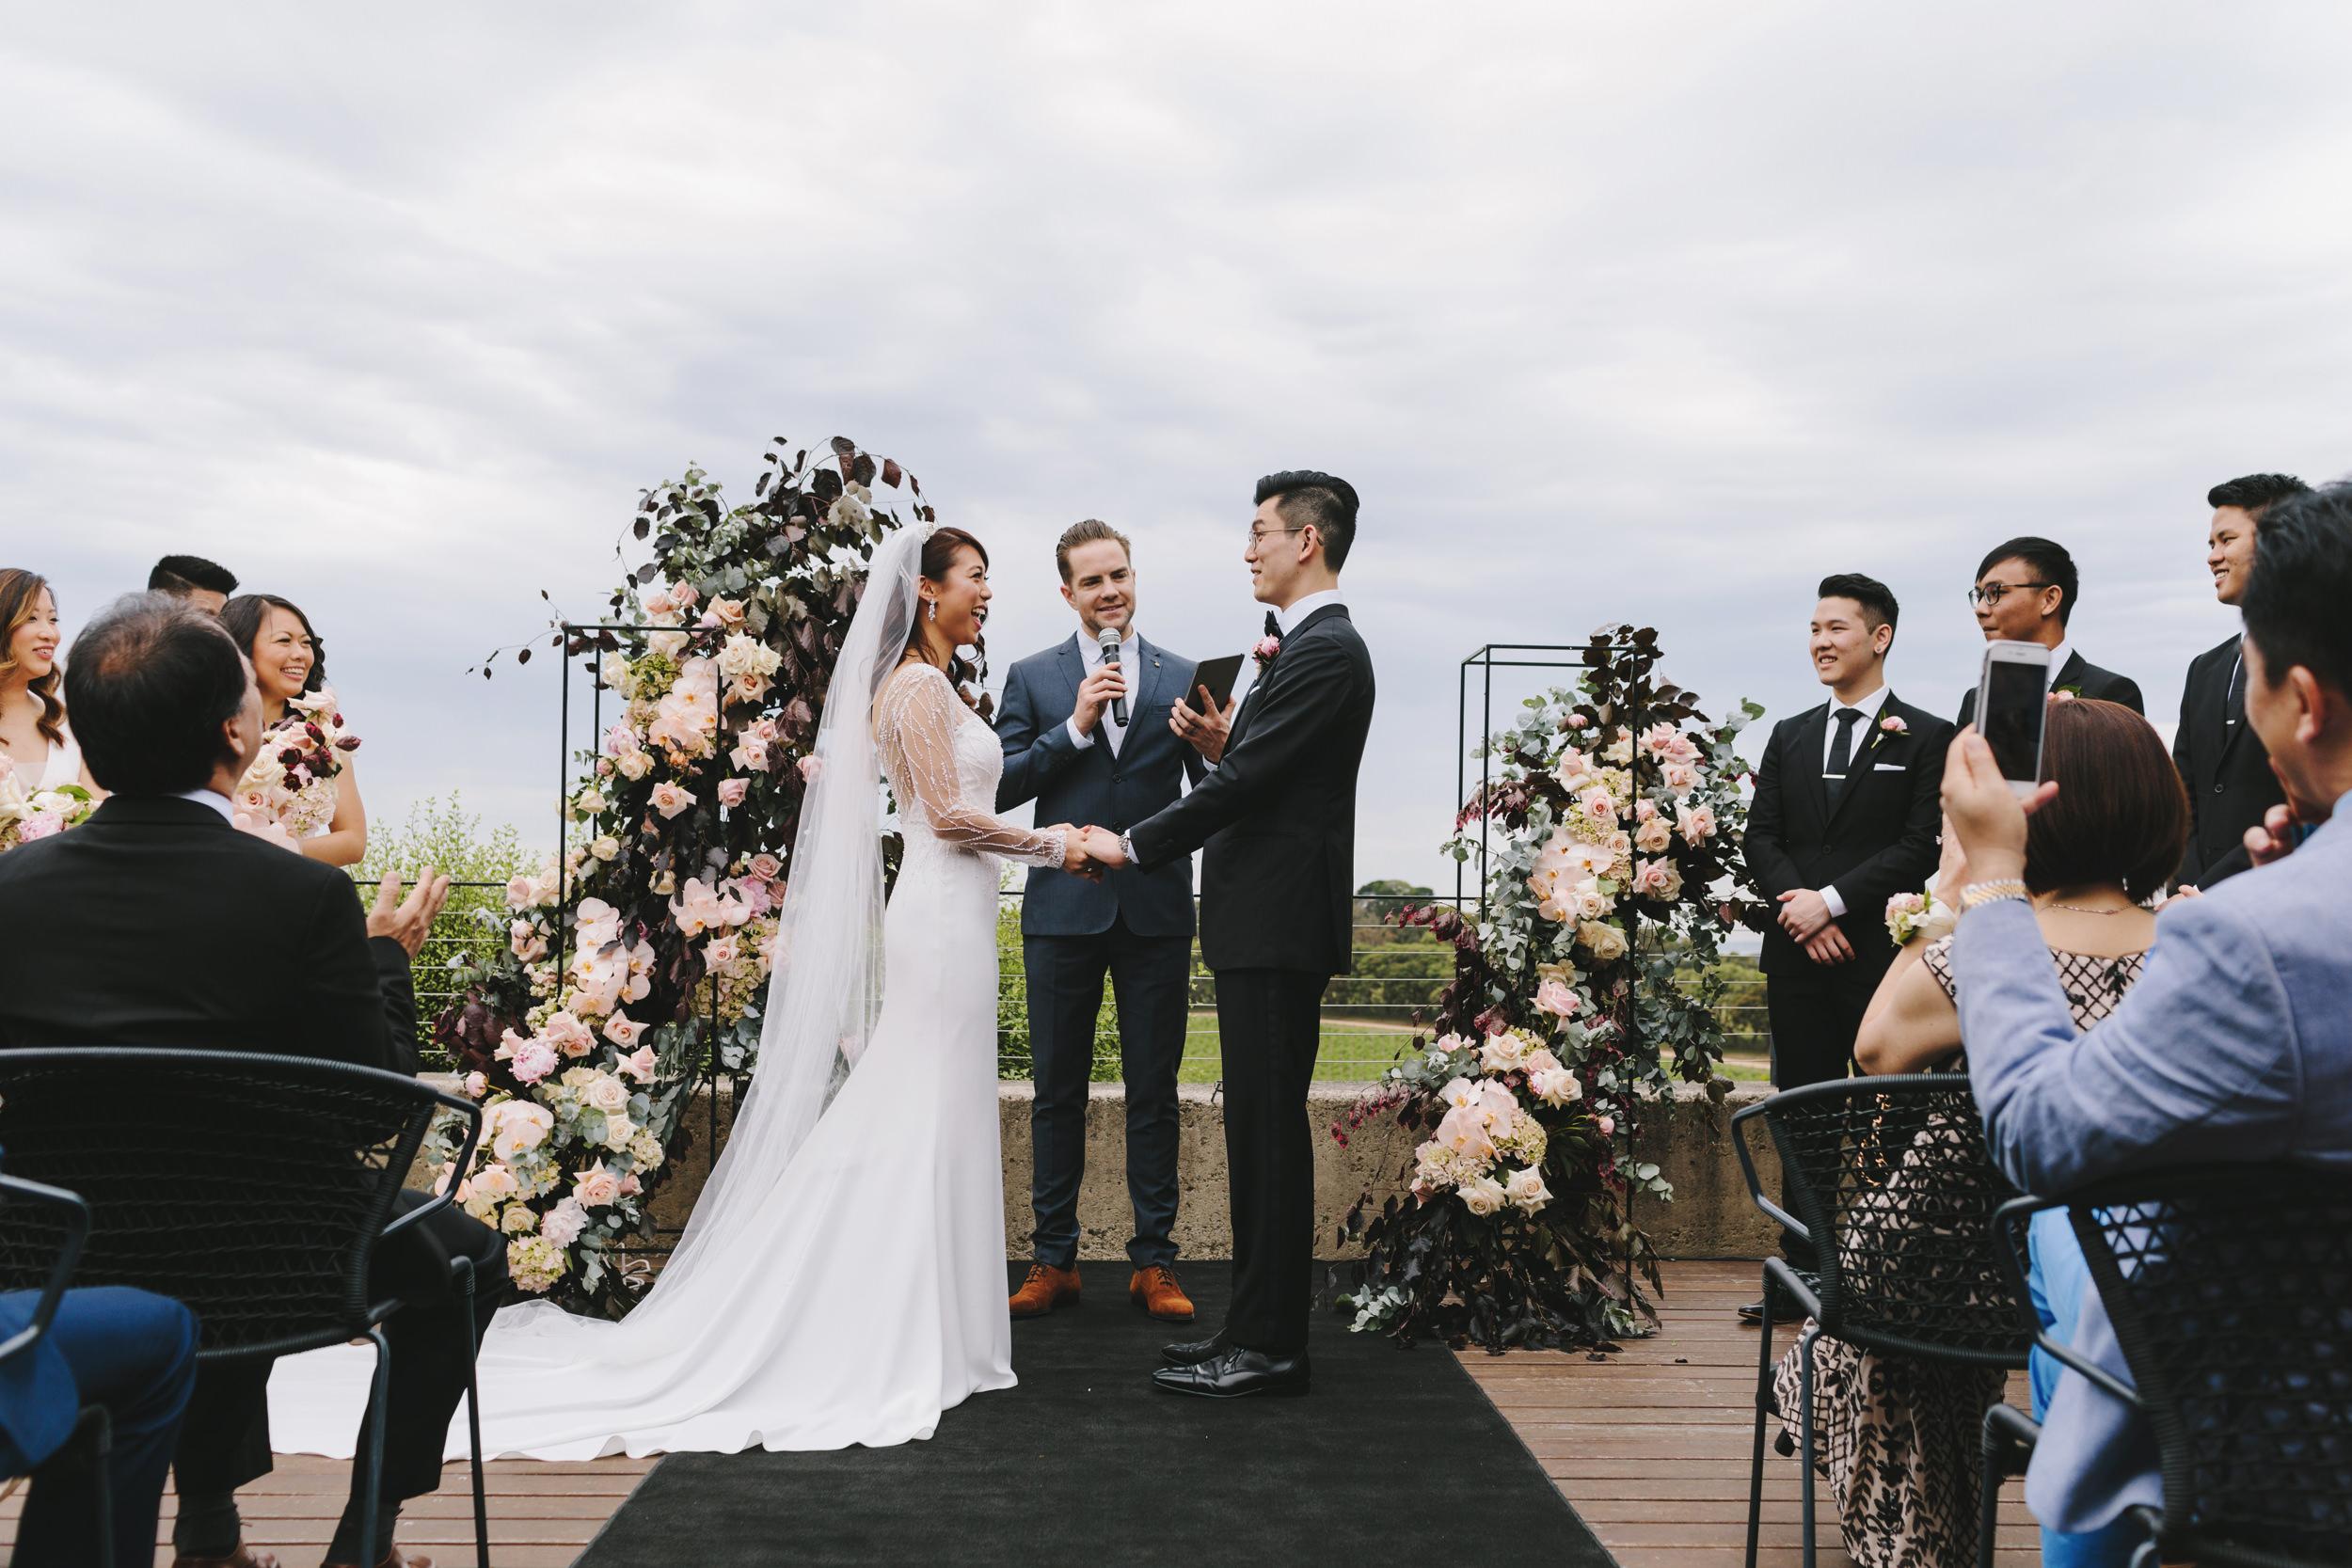 Melbourne Winery Wedding Daryl & Adeline 46.JPG